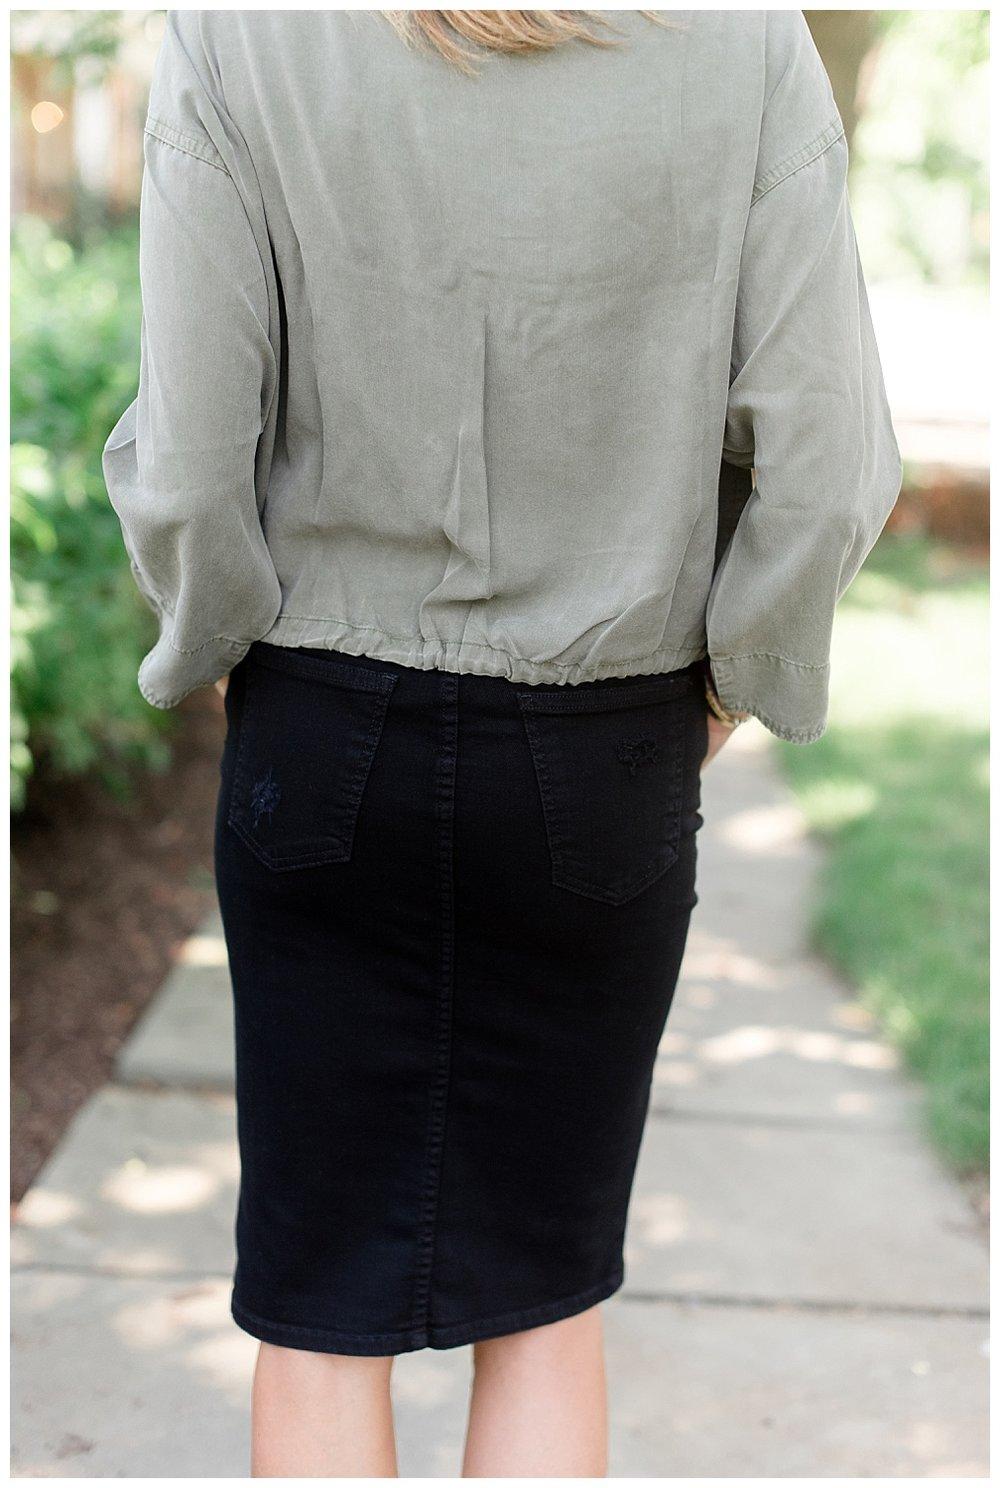 Army Jacket Black Denim Skirt_1709.jpg